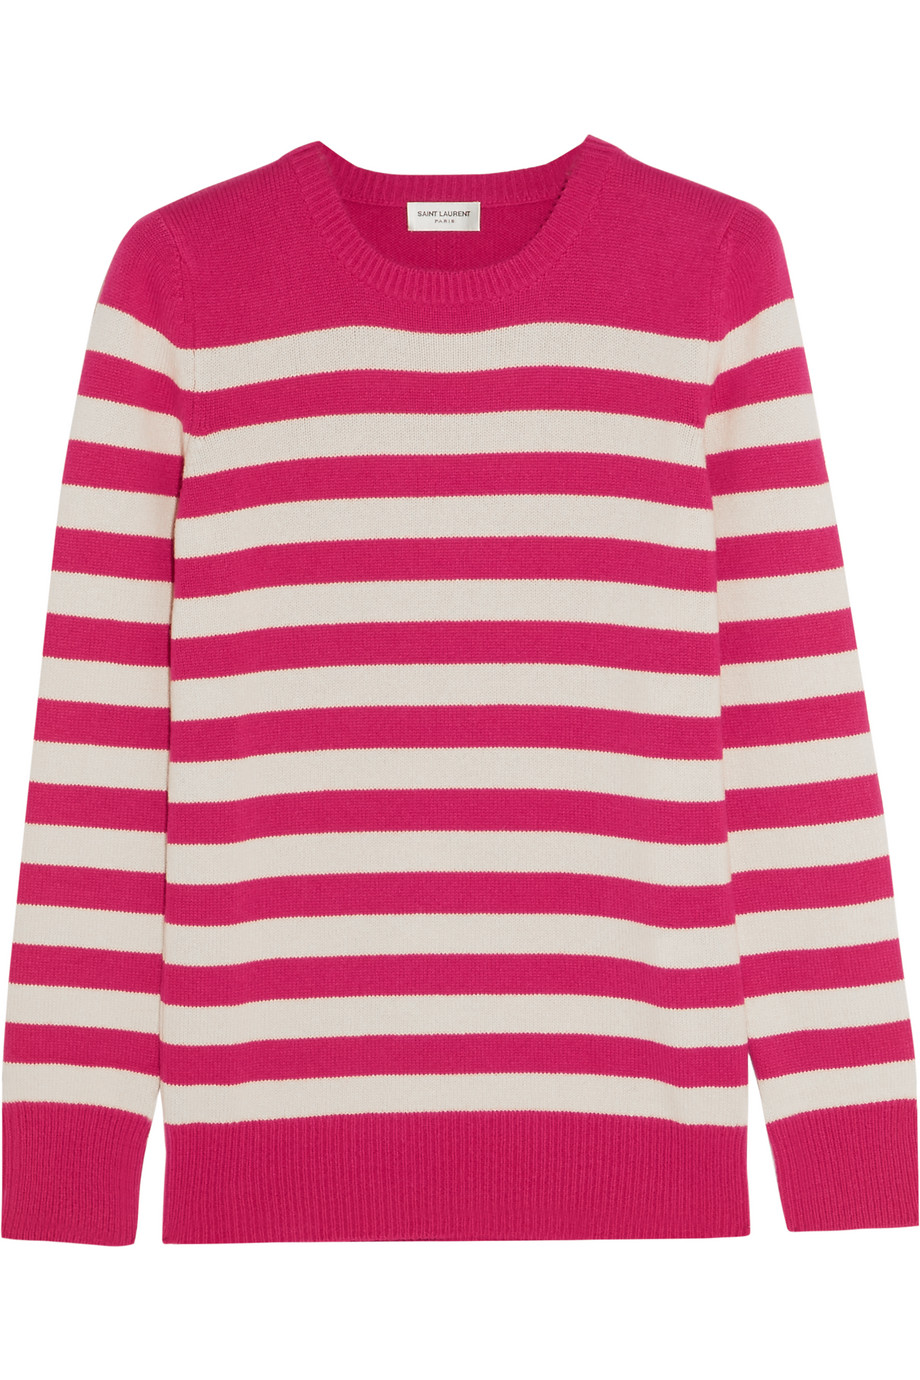 Saint Laurent Striped Cashmere Sweater, Fuchsia, Women's, Size: XL